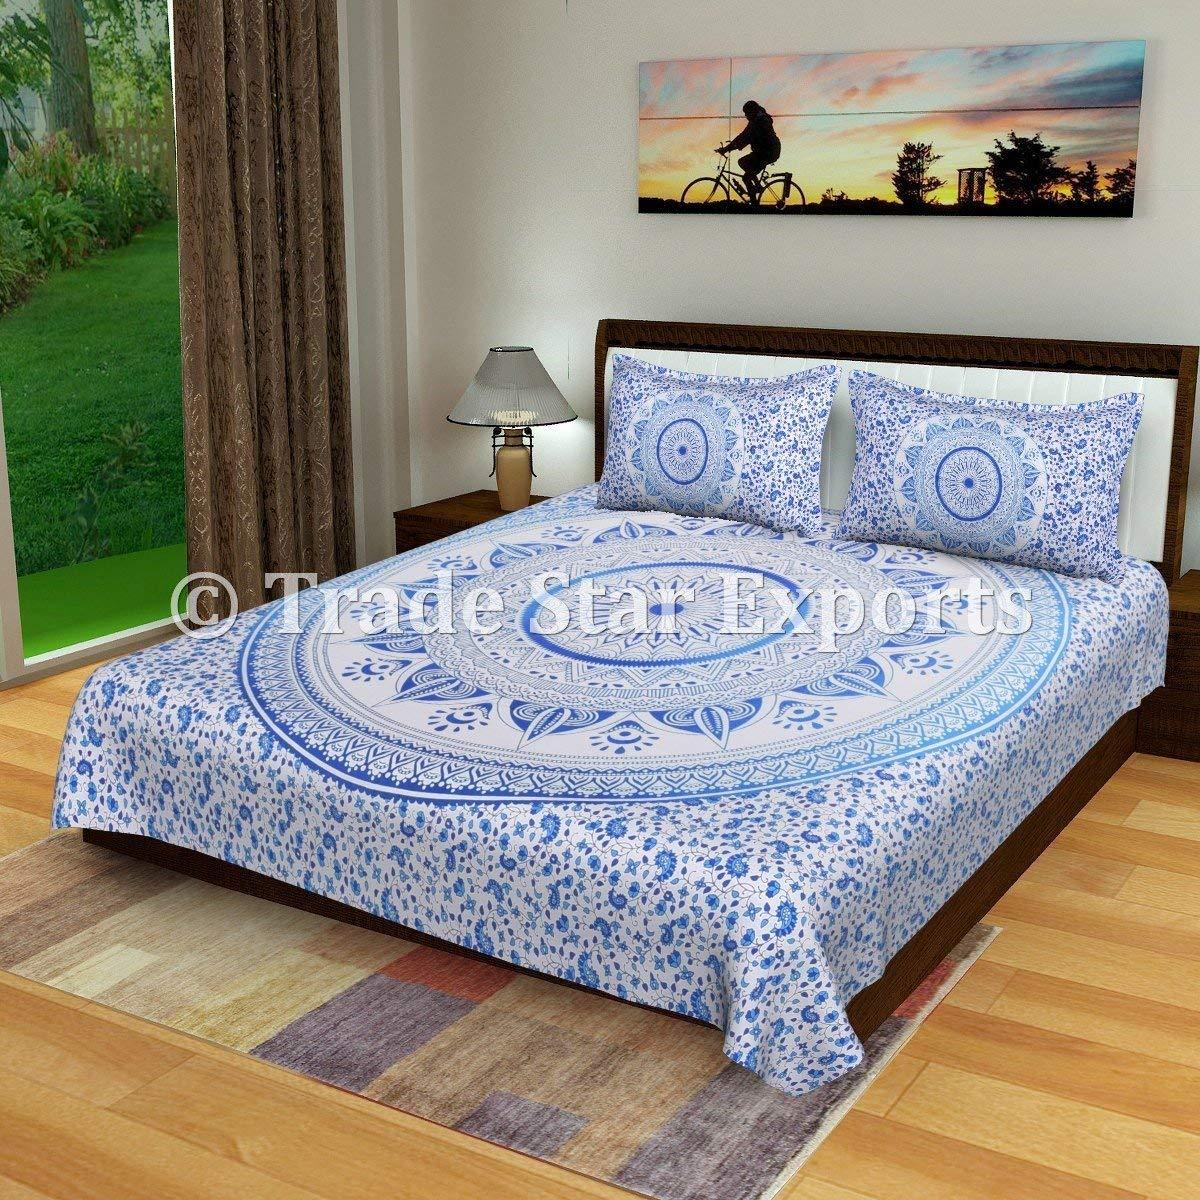 Home Bedding flat sheet set Indian Mandala Bedding Set Cotton Single Size Tapestry Bed Set Twin Kids Bedding